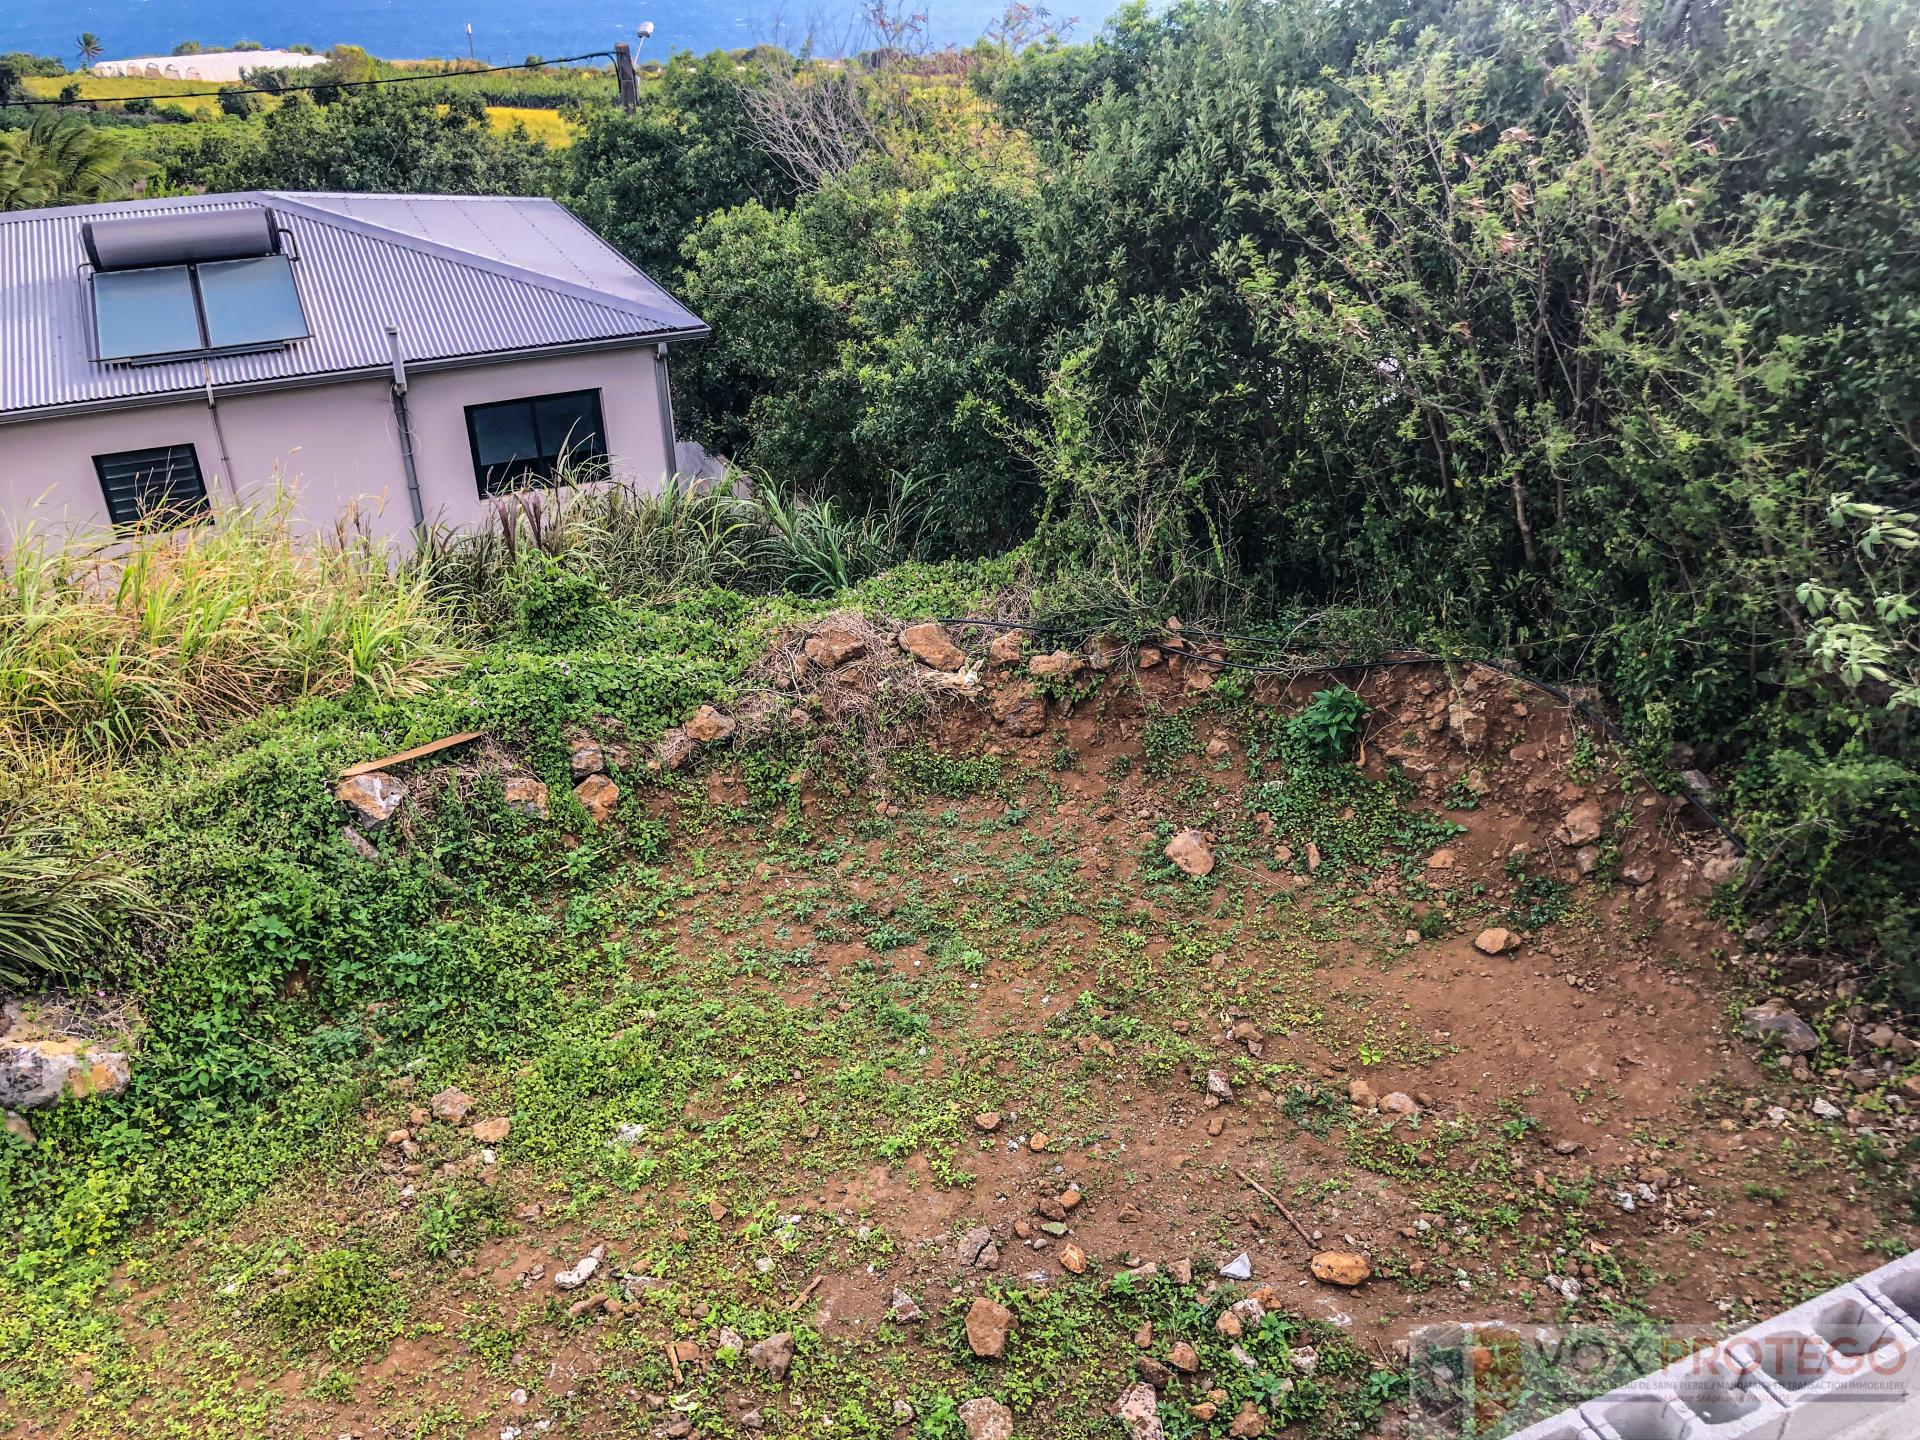 Terrain à bâtir de 394 m2 à Petite-Ile (Réunion)